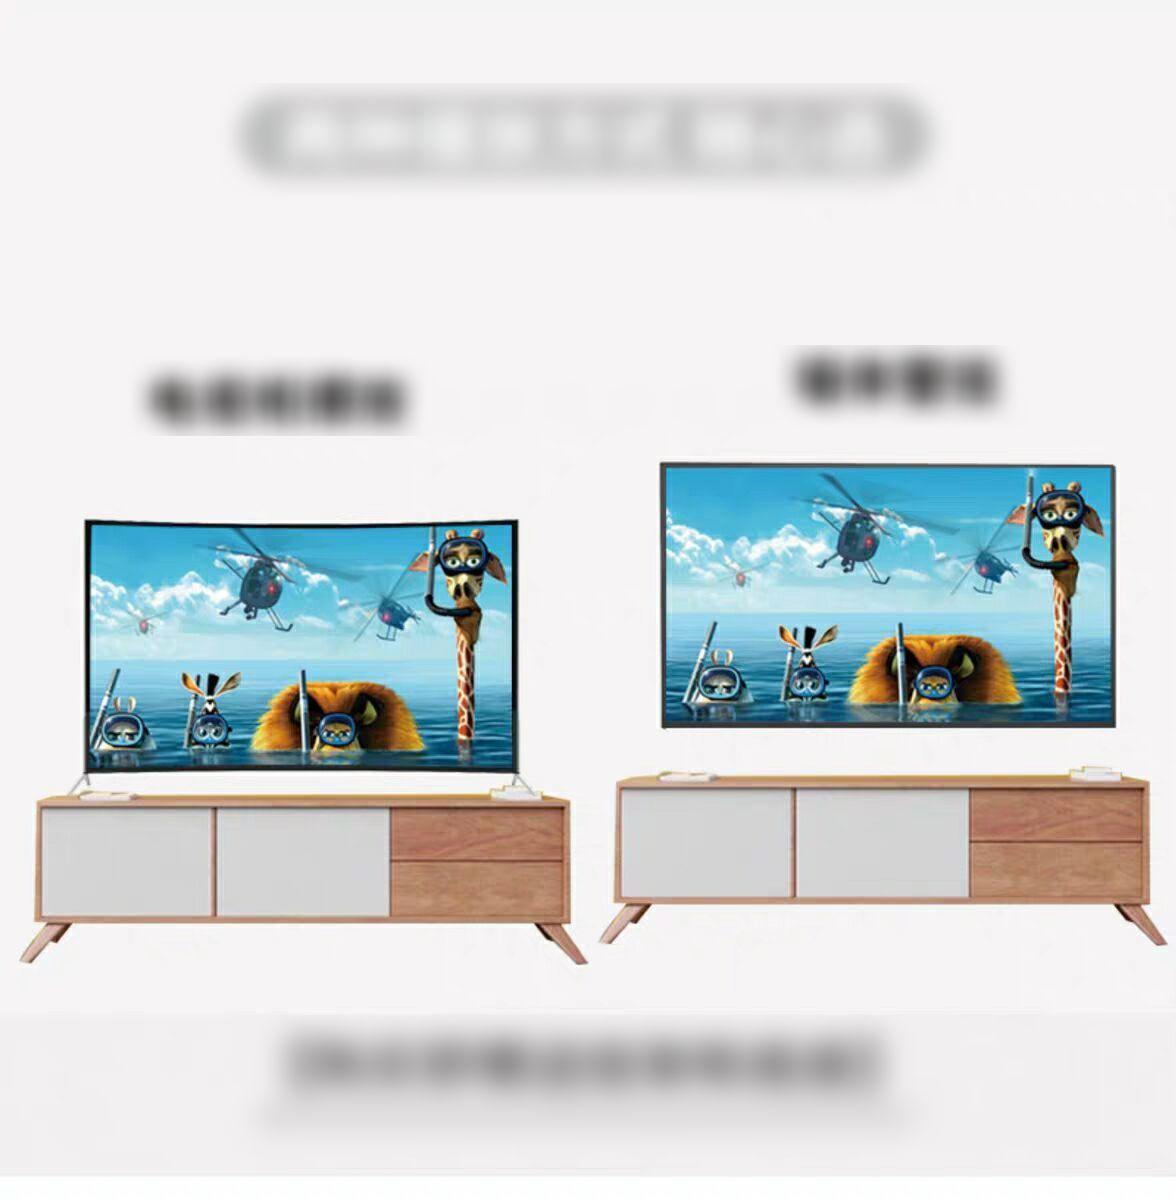 LCD TV HD Intelligent Network WiFi Home TV